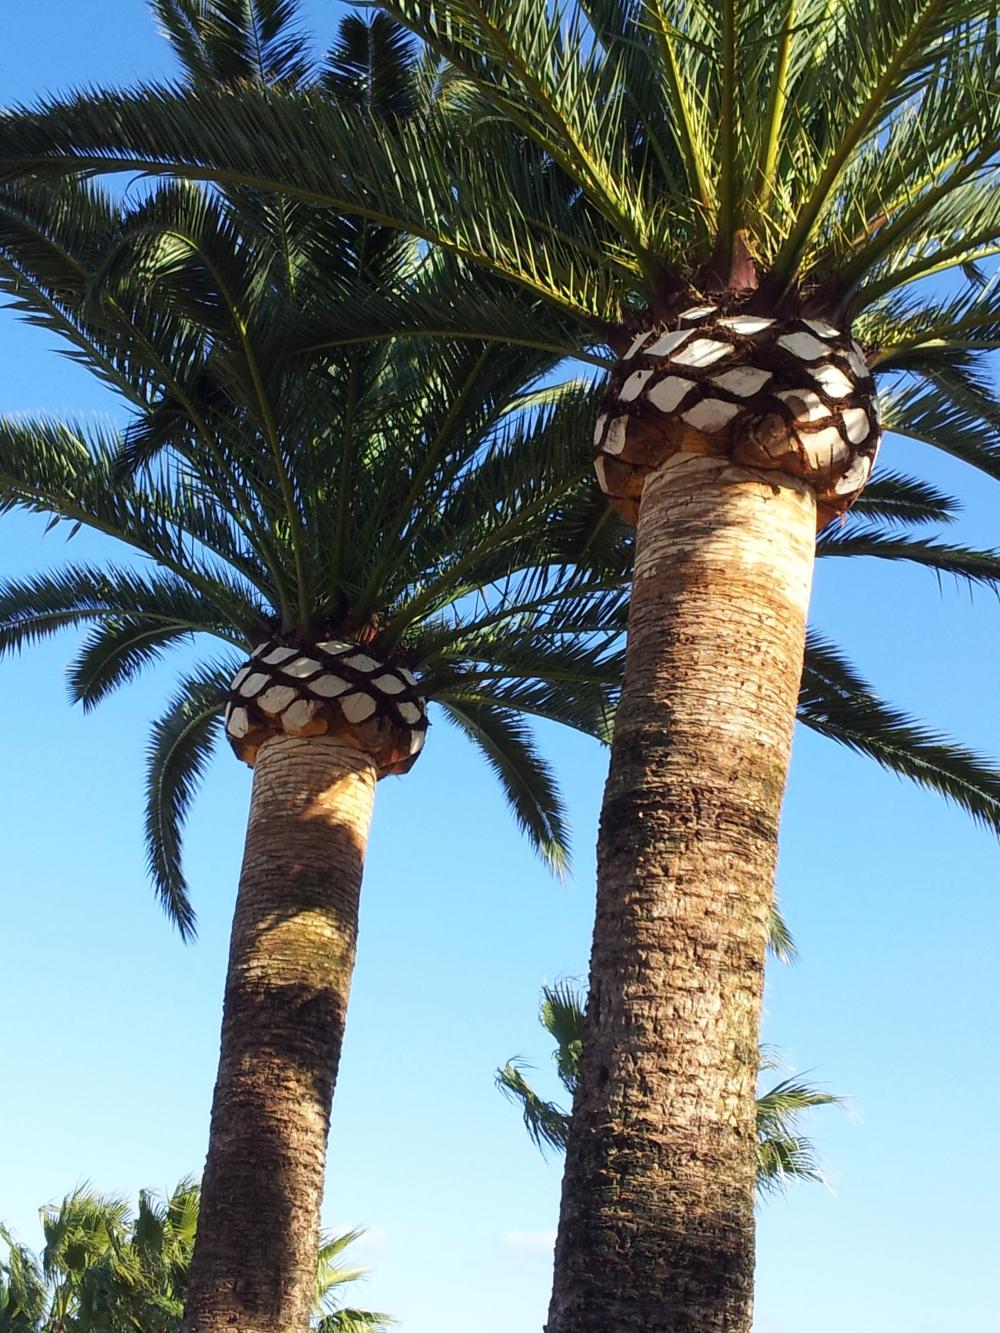 Ilex jardiner a empresa de podas en alicante empresa de for Empresas de jardineria valencia